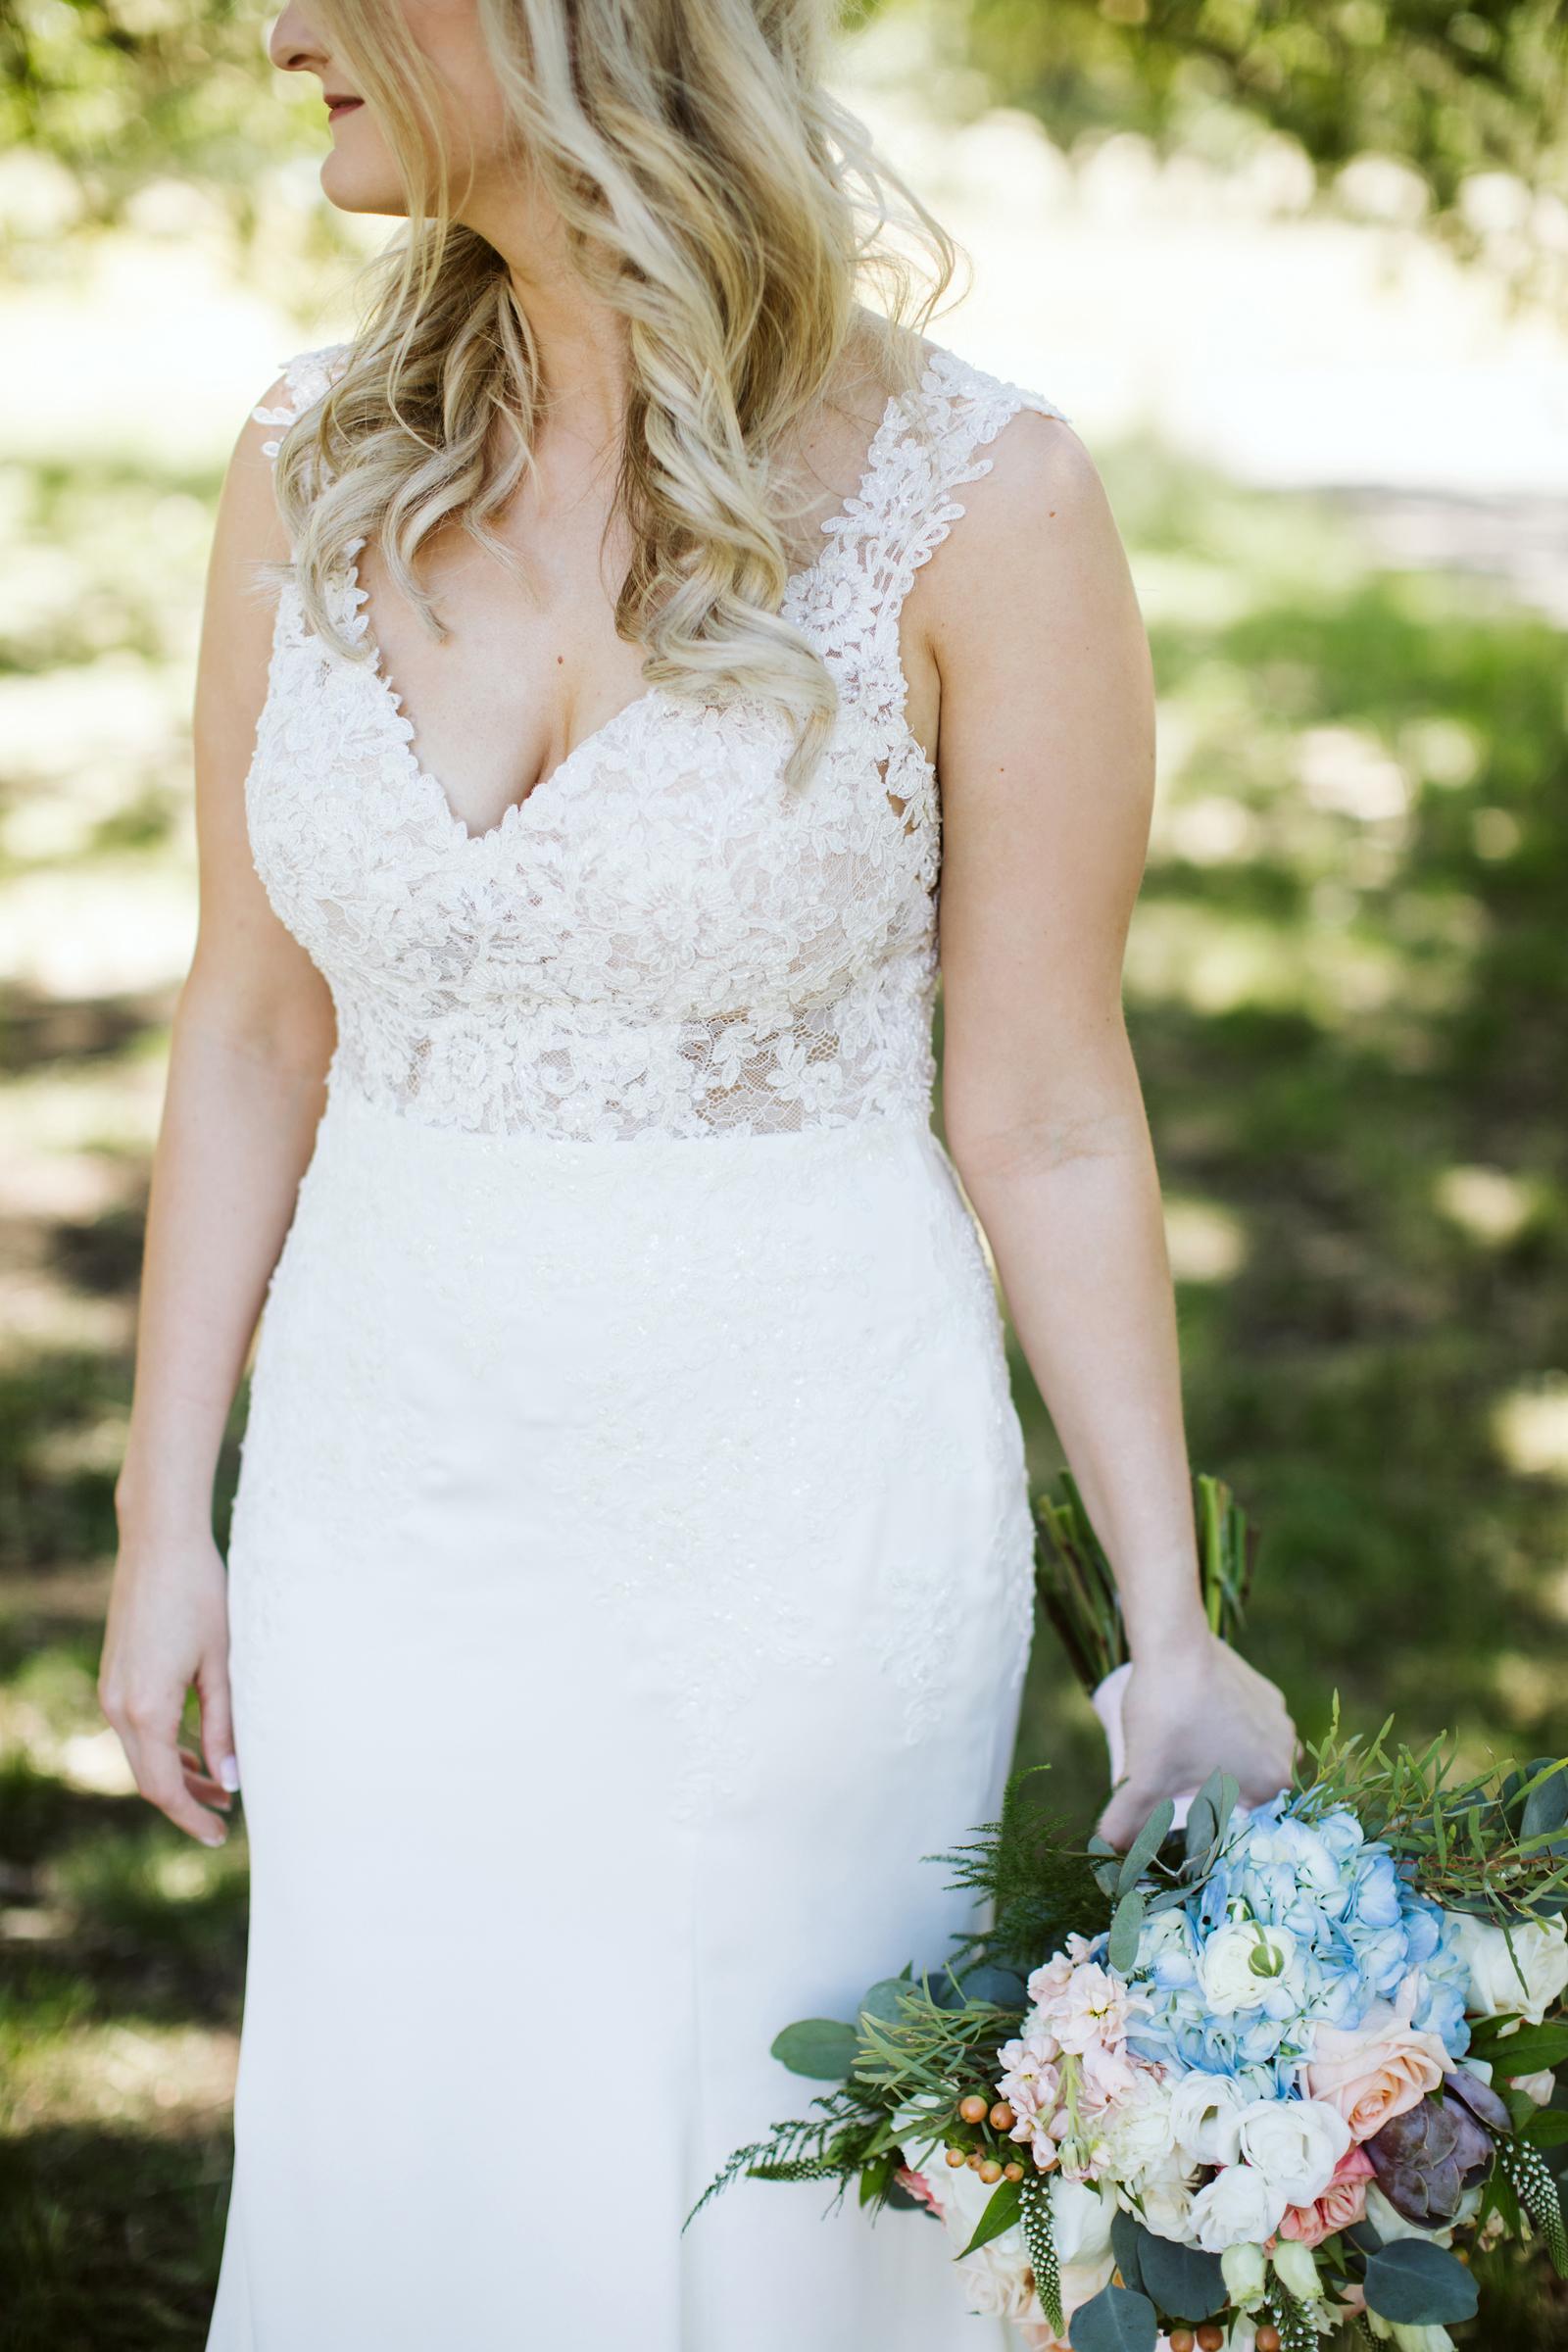 012-daronjackson-rachel-michael-wedding-mtpisgah.jpg